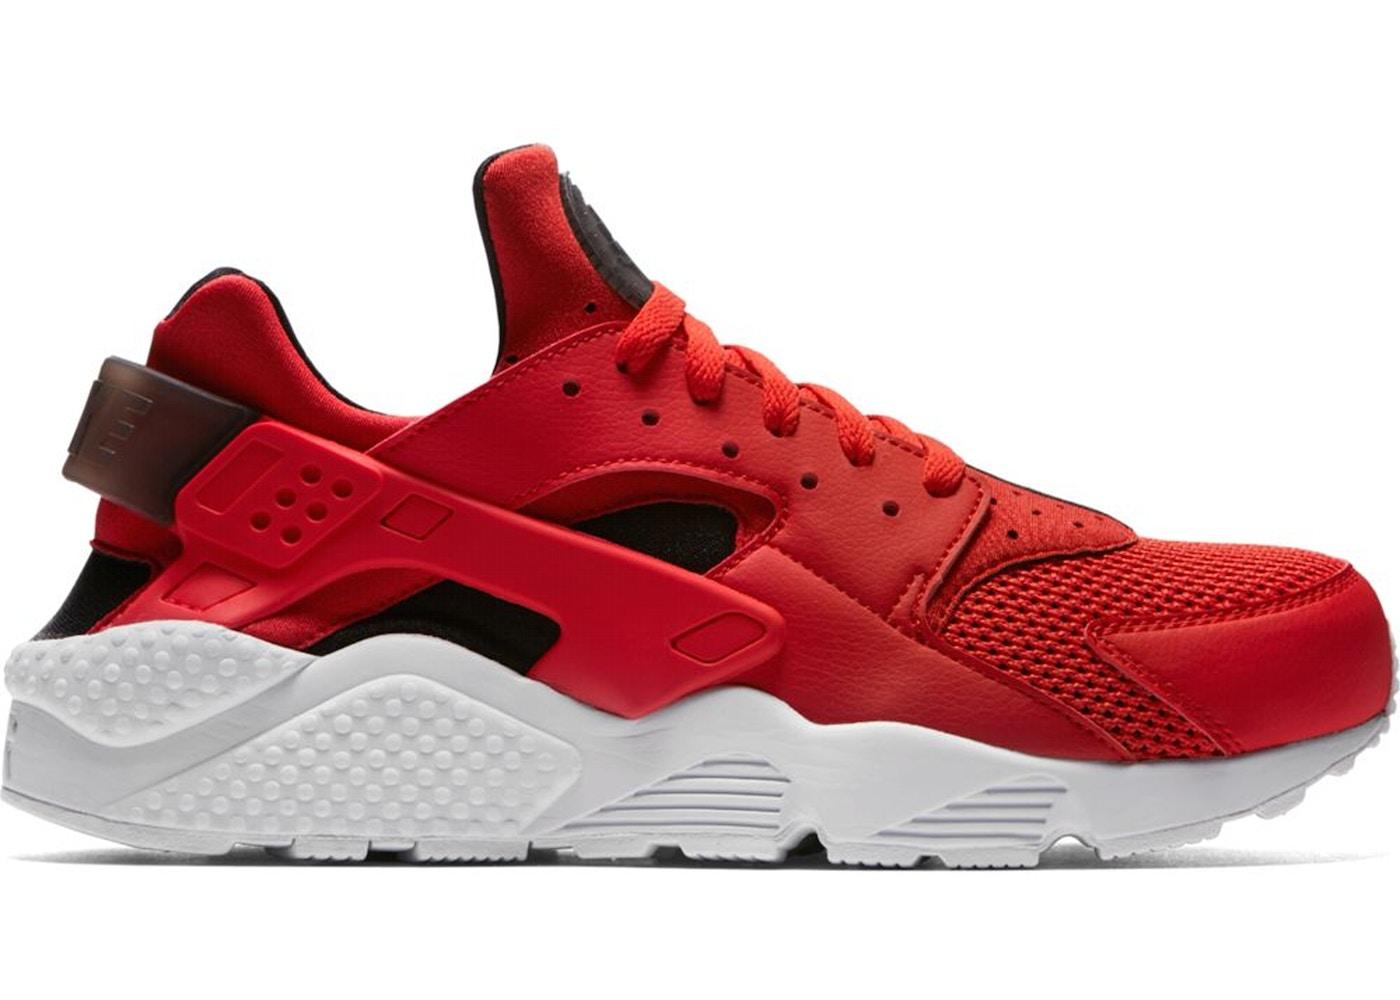 Nike Air Huarache Run Habanero Red